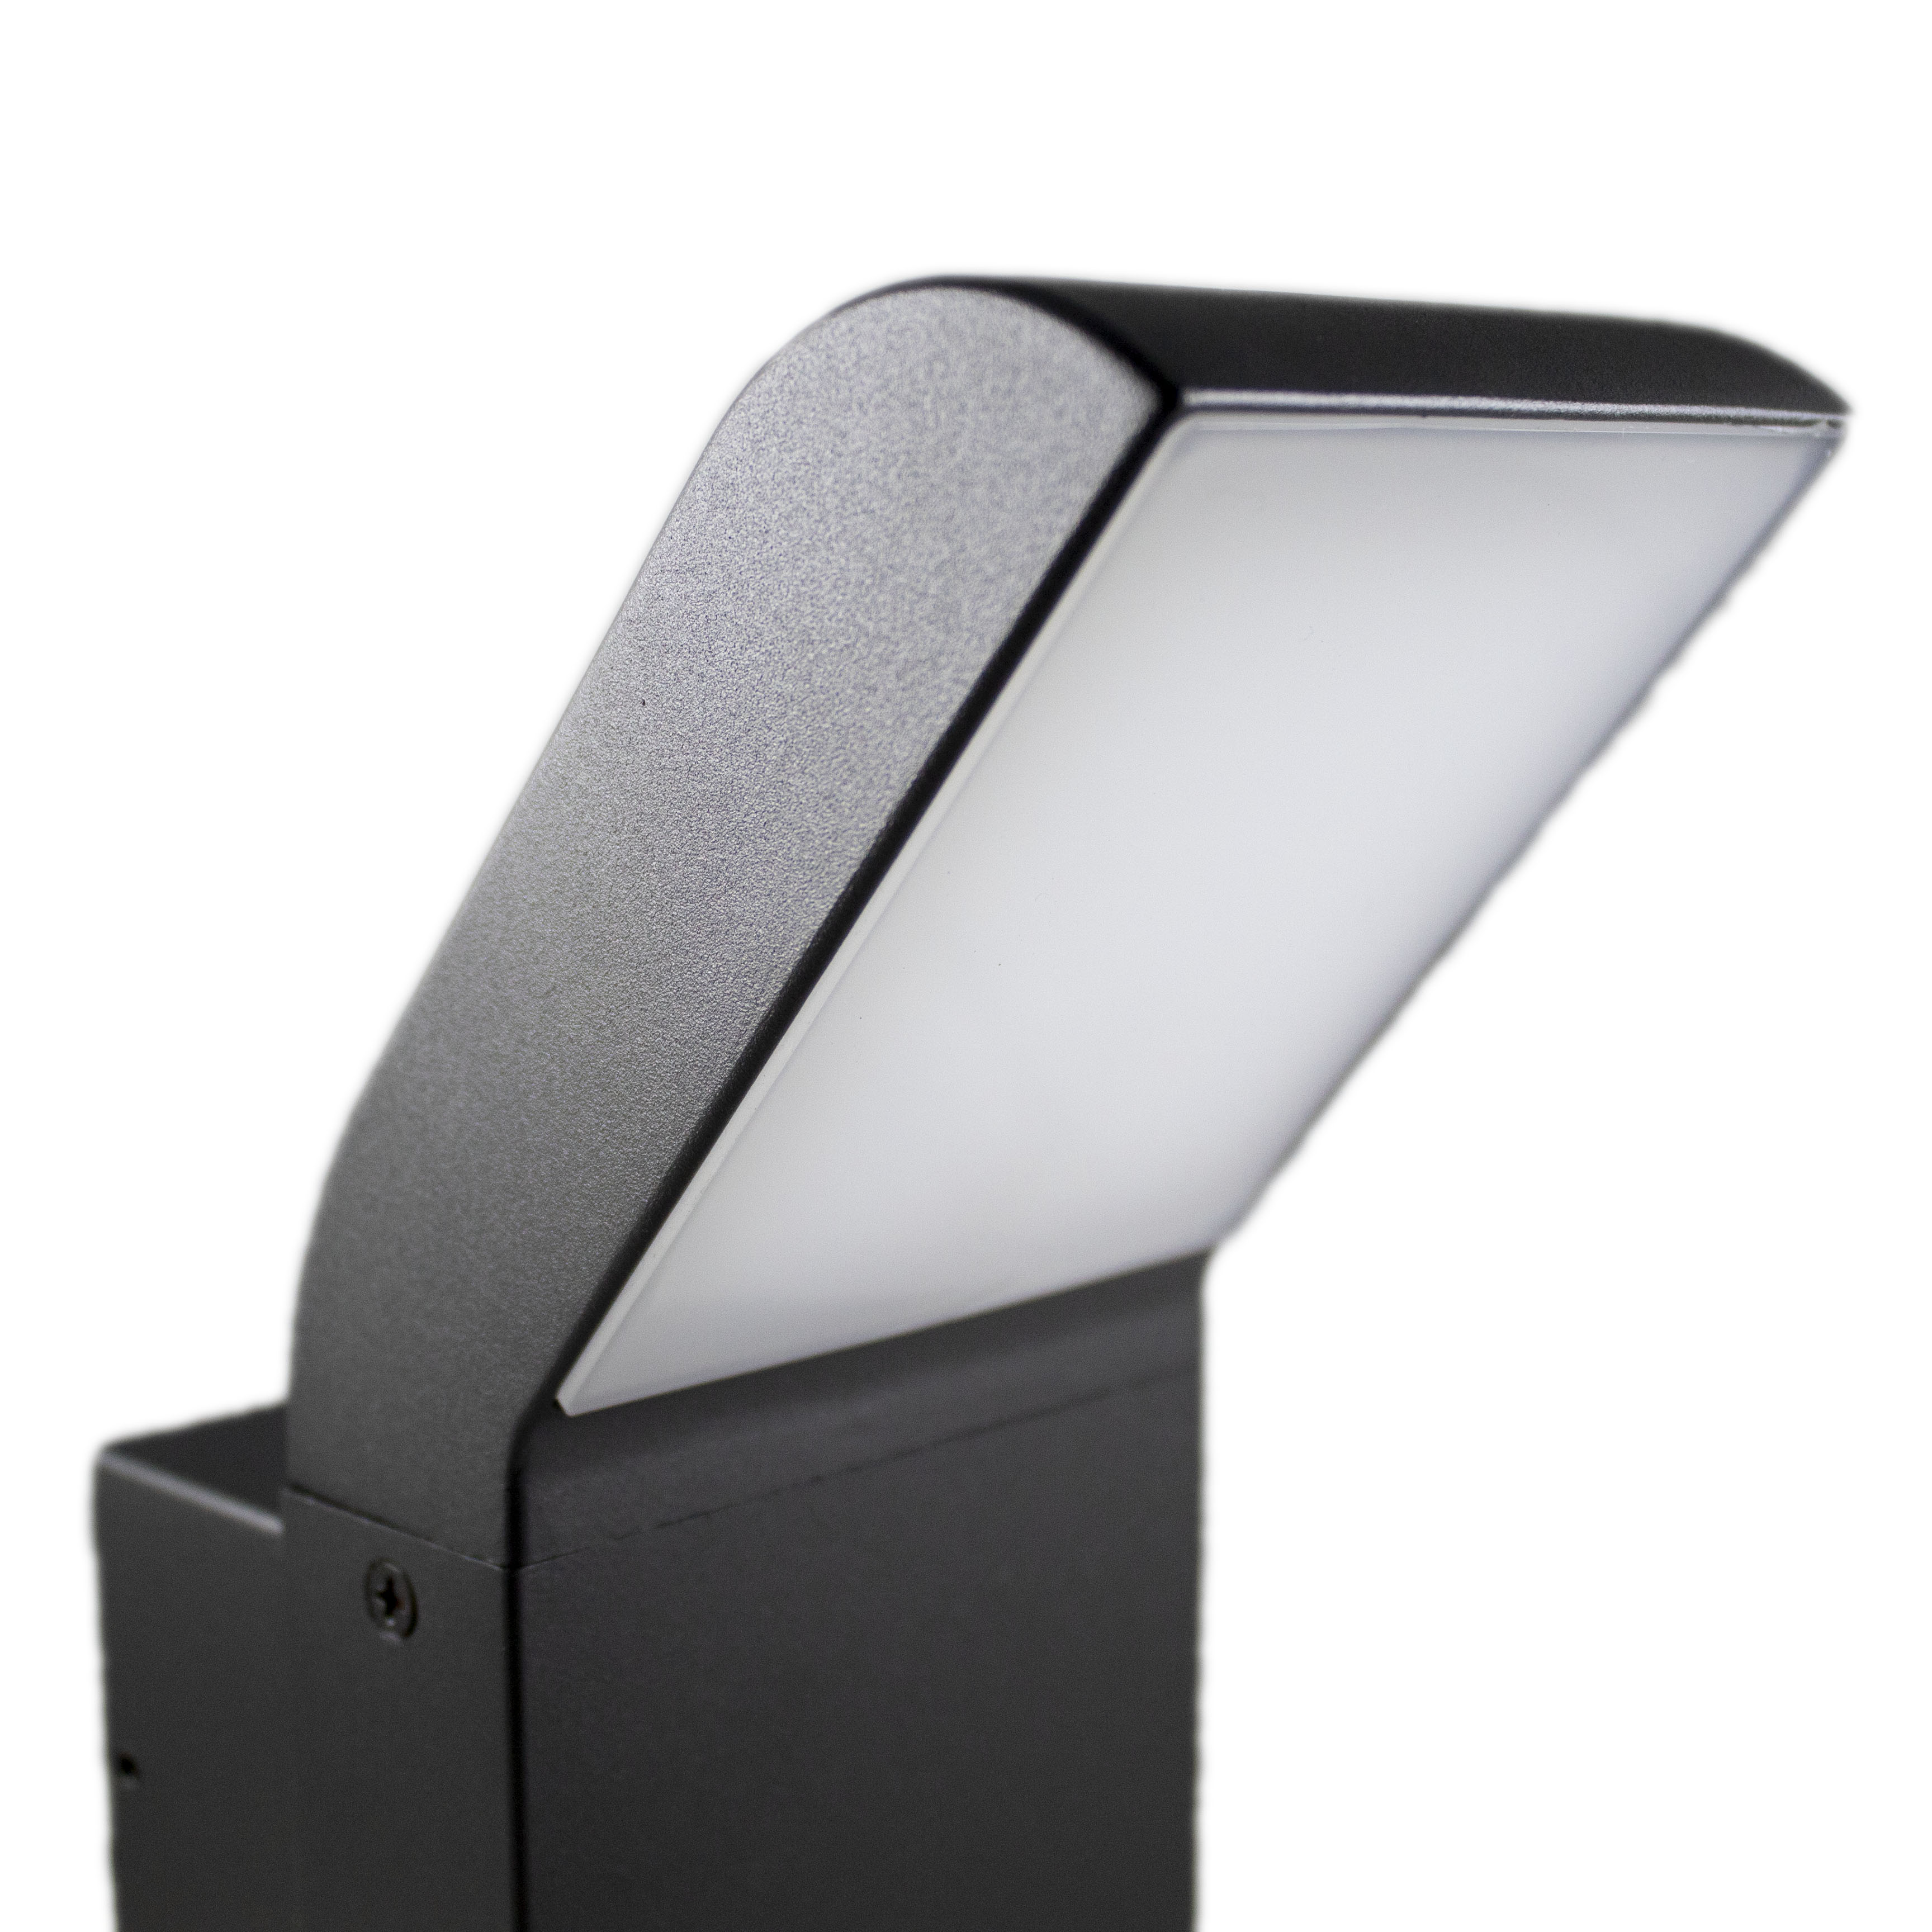 Wandlamp buiten 12 watt 4000K - naturel wit - lamp